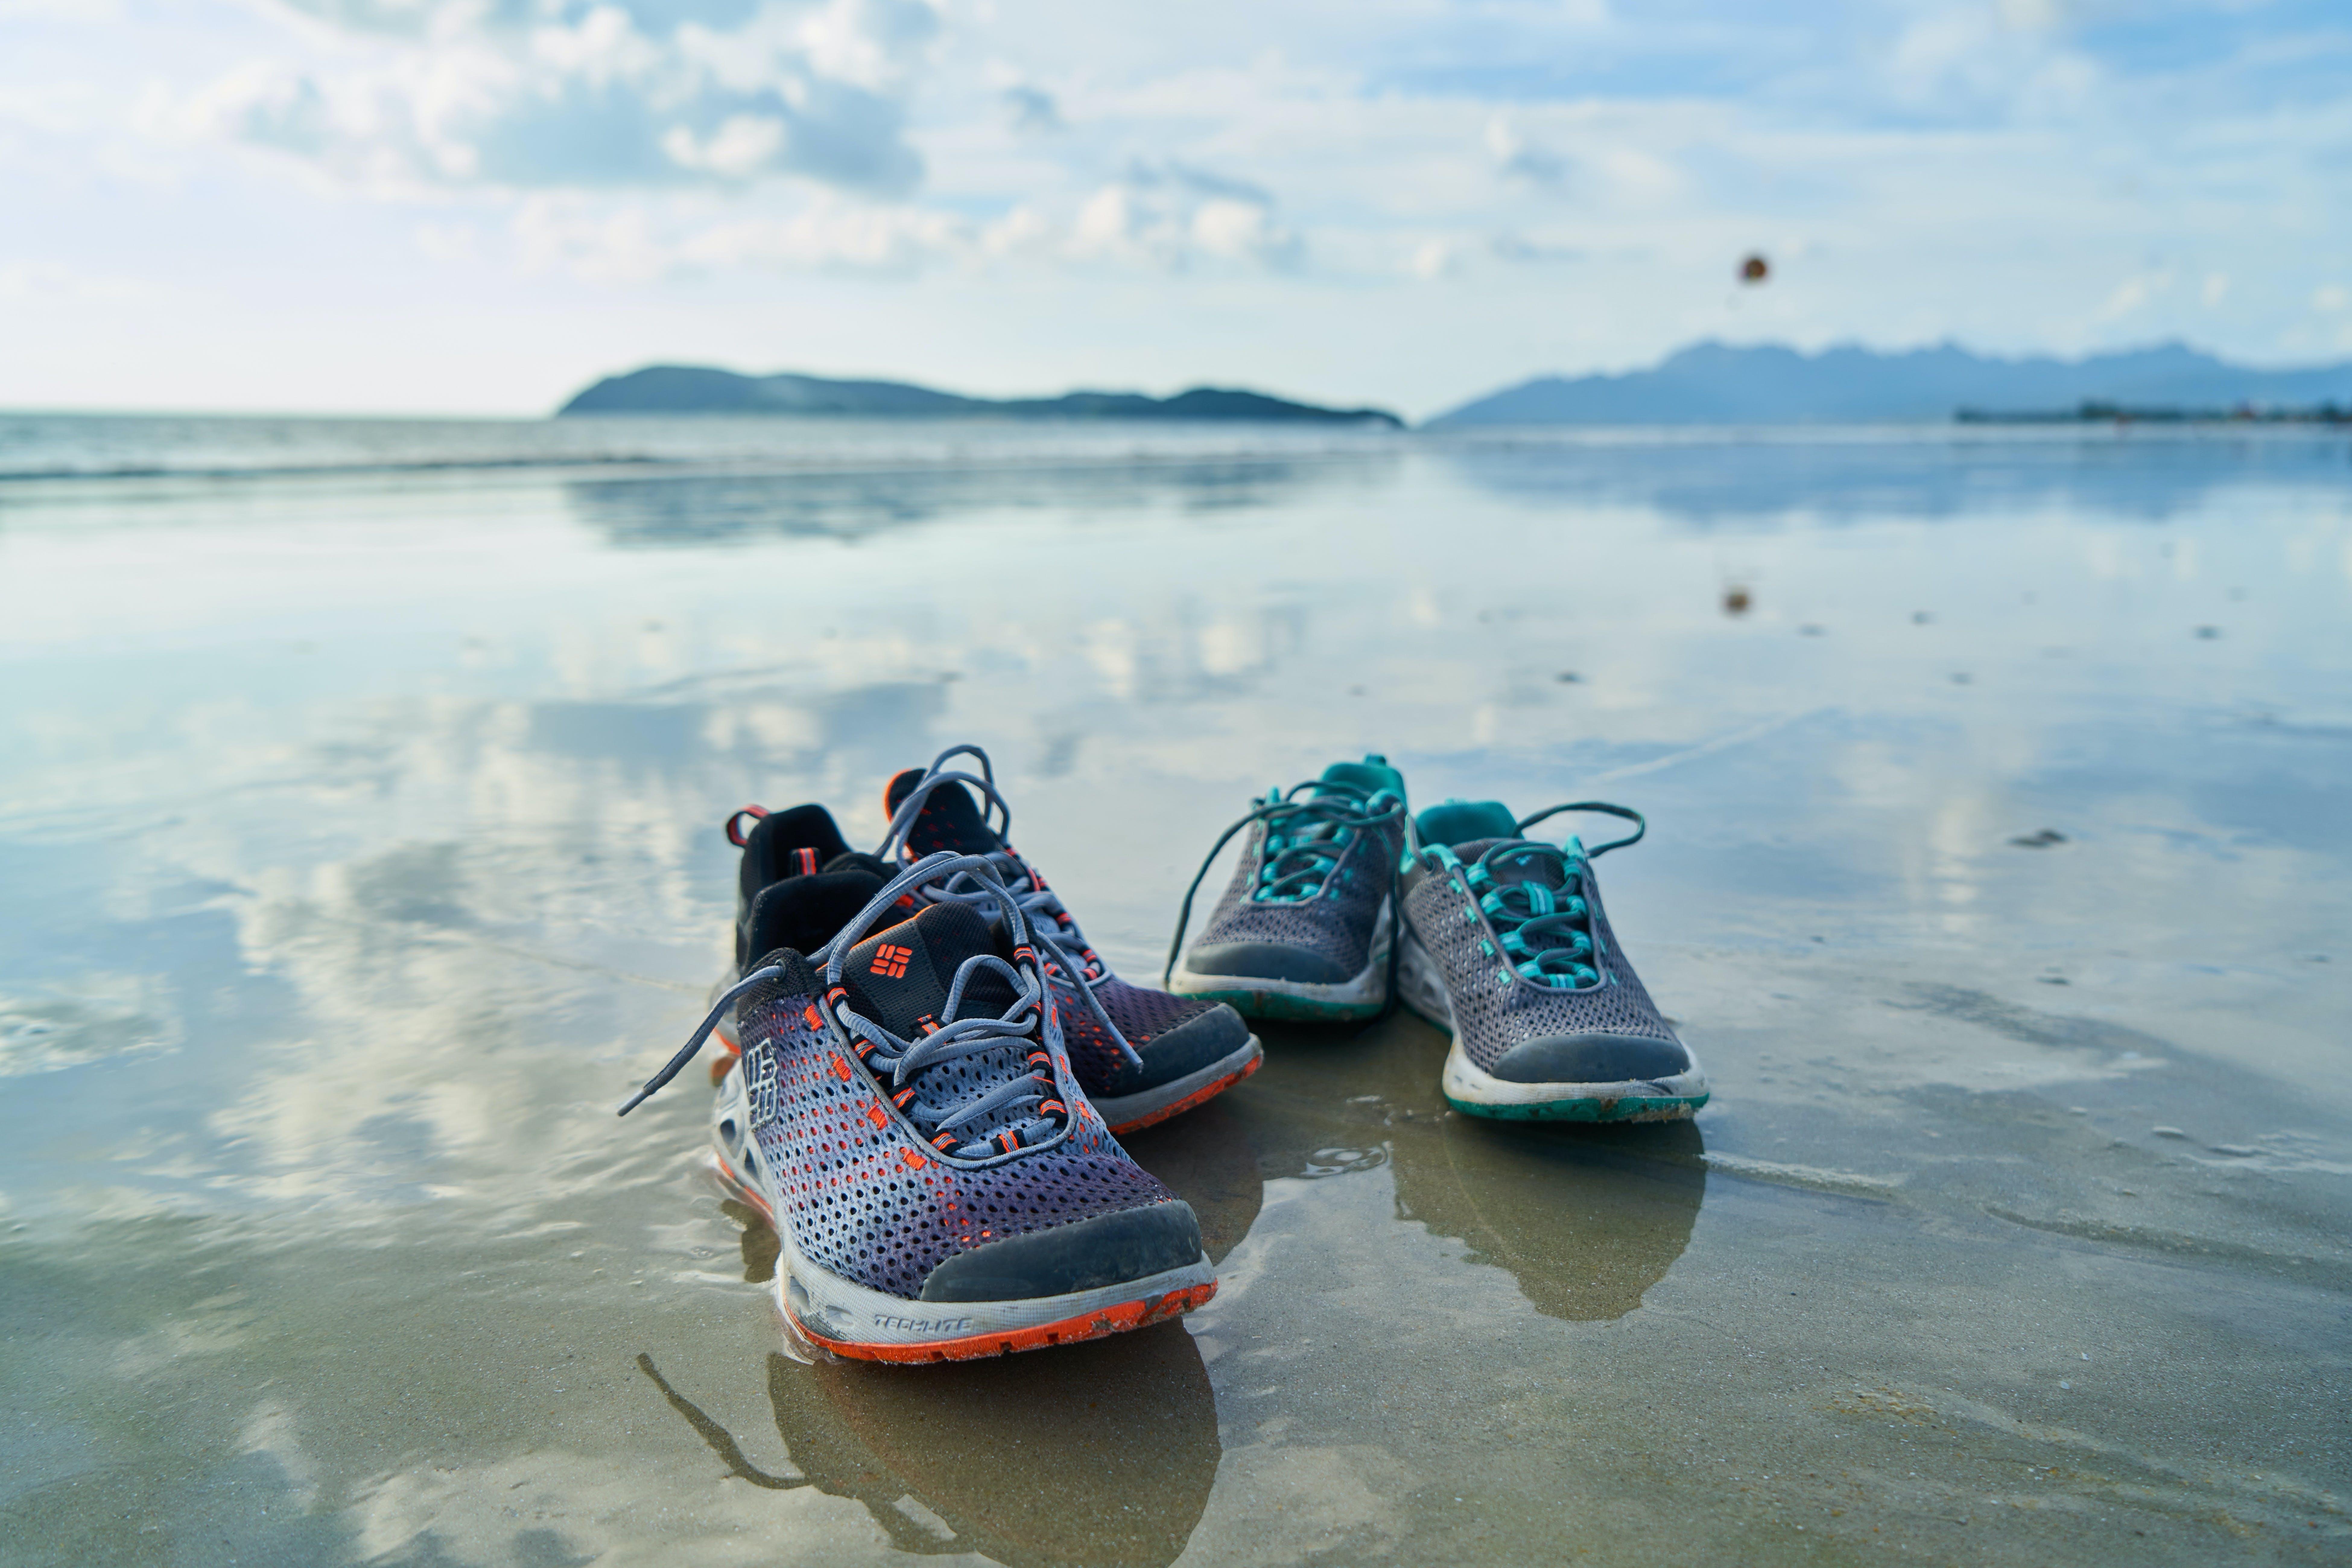 Free stock photo of landscape, nature, beach, blue